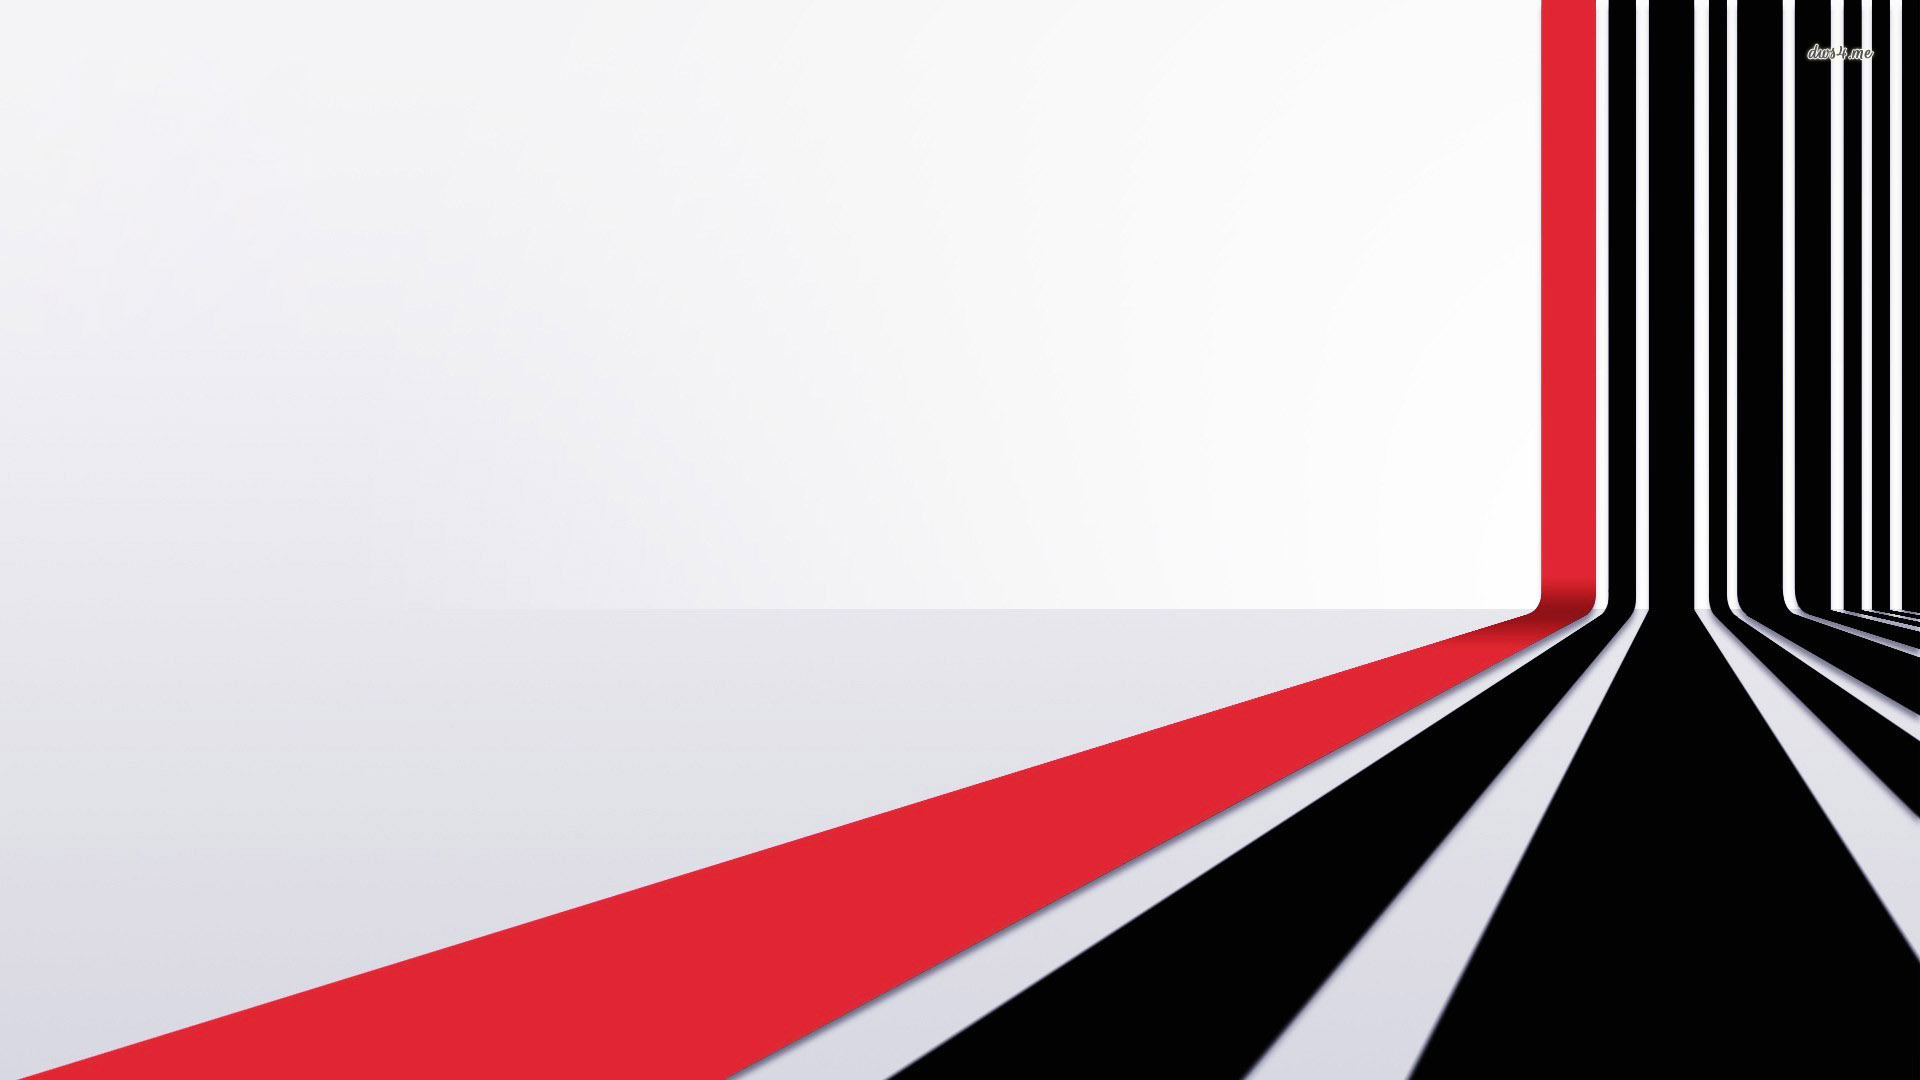 Black white red wallpaper wallpapersafari for Red wallpaper ideas